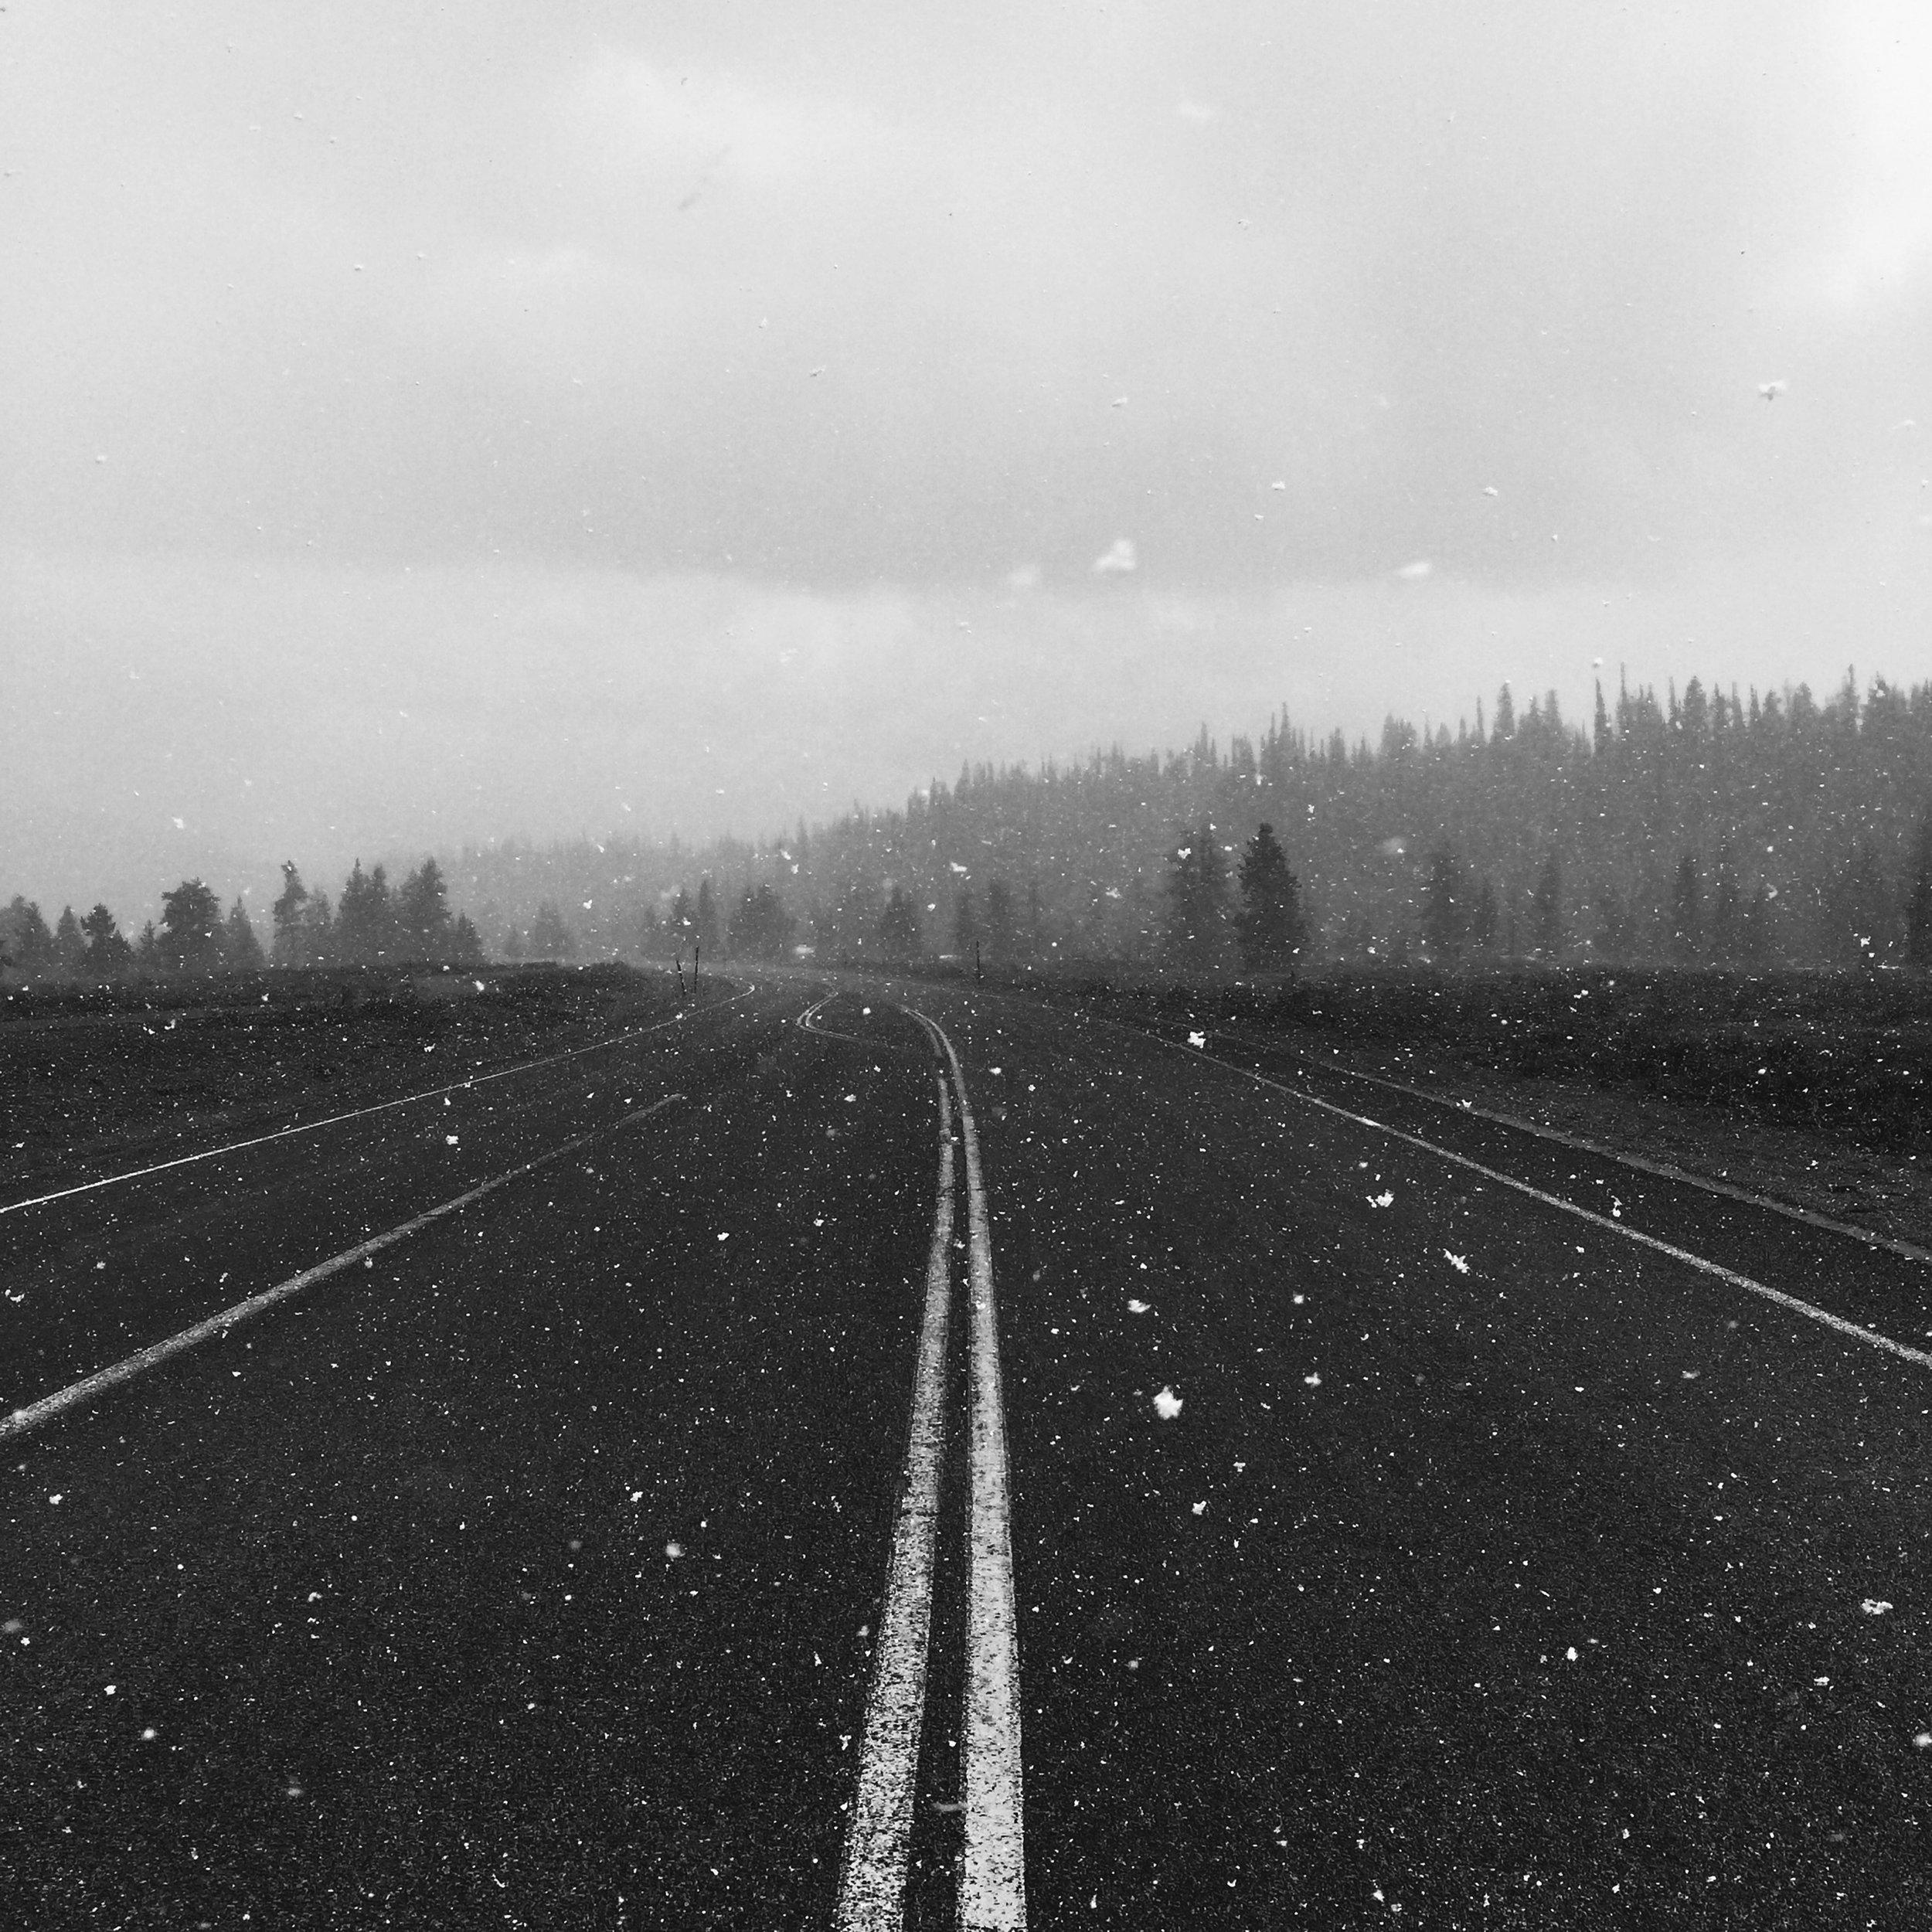 snowfall_road.jpg